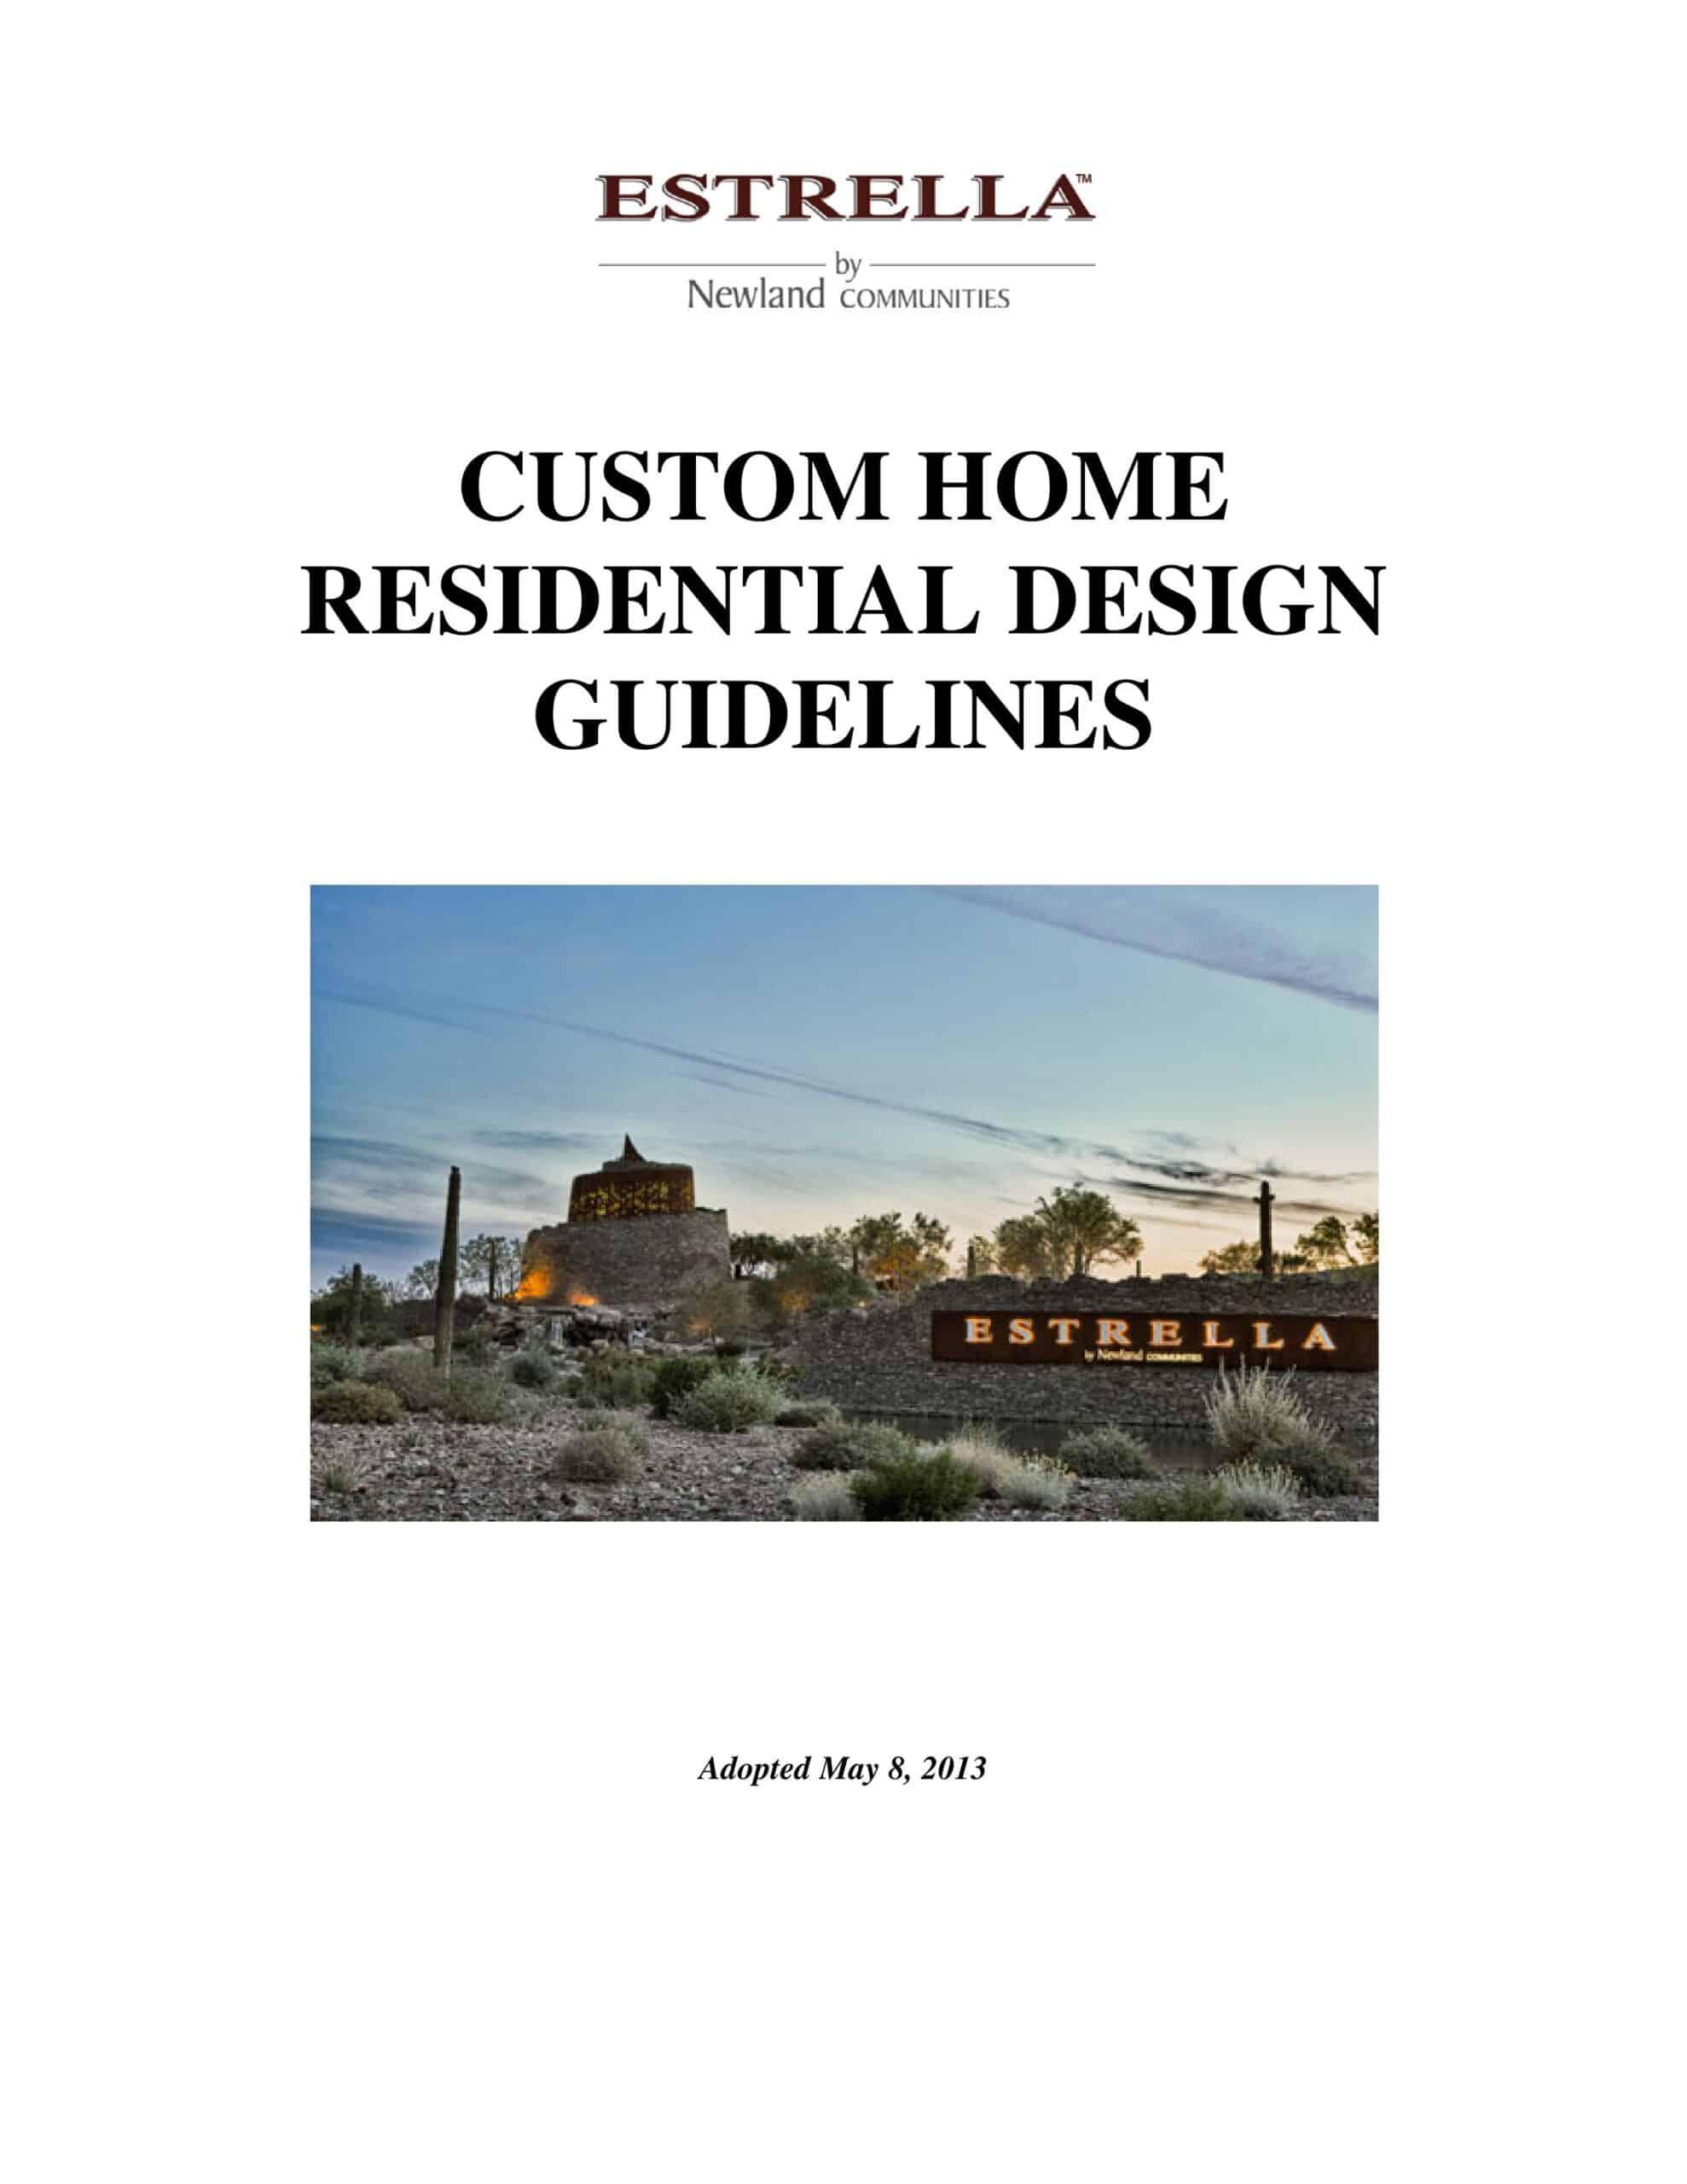 ESTRELLA MOUNTAIN CUSTOM HOME GUIDELINES-page-001